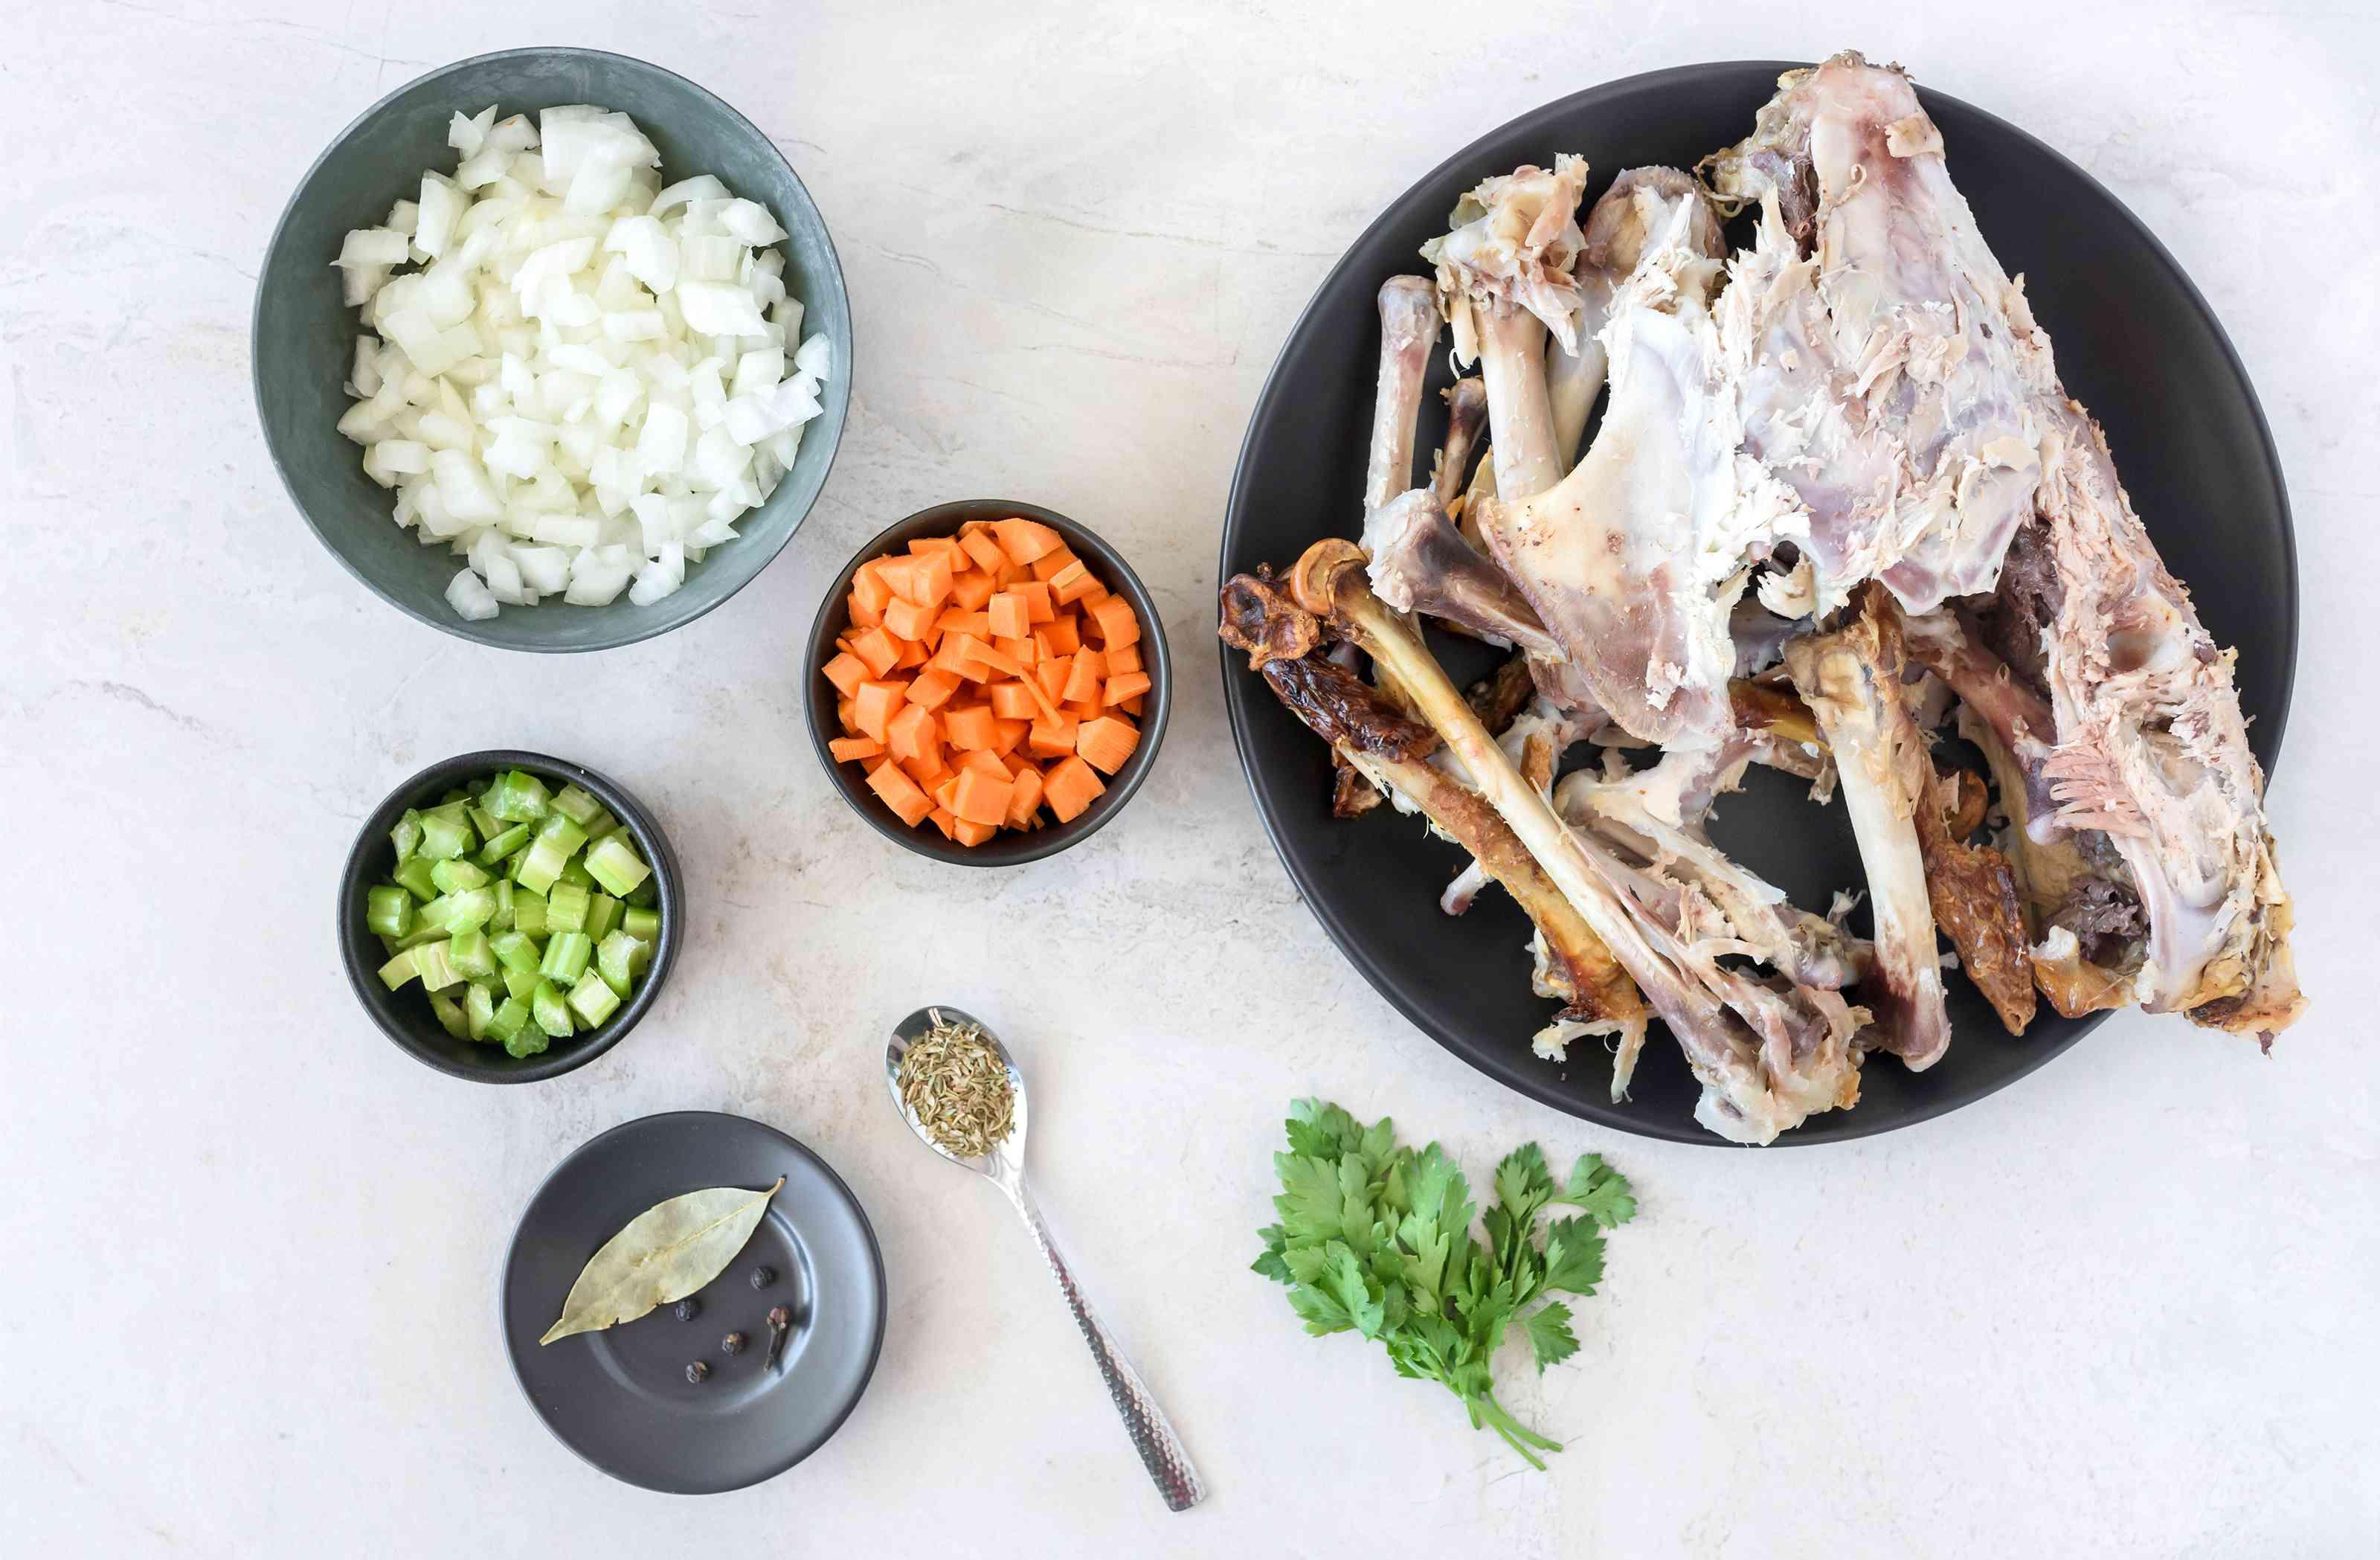 Turkey stock ingredients